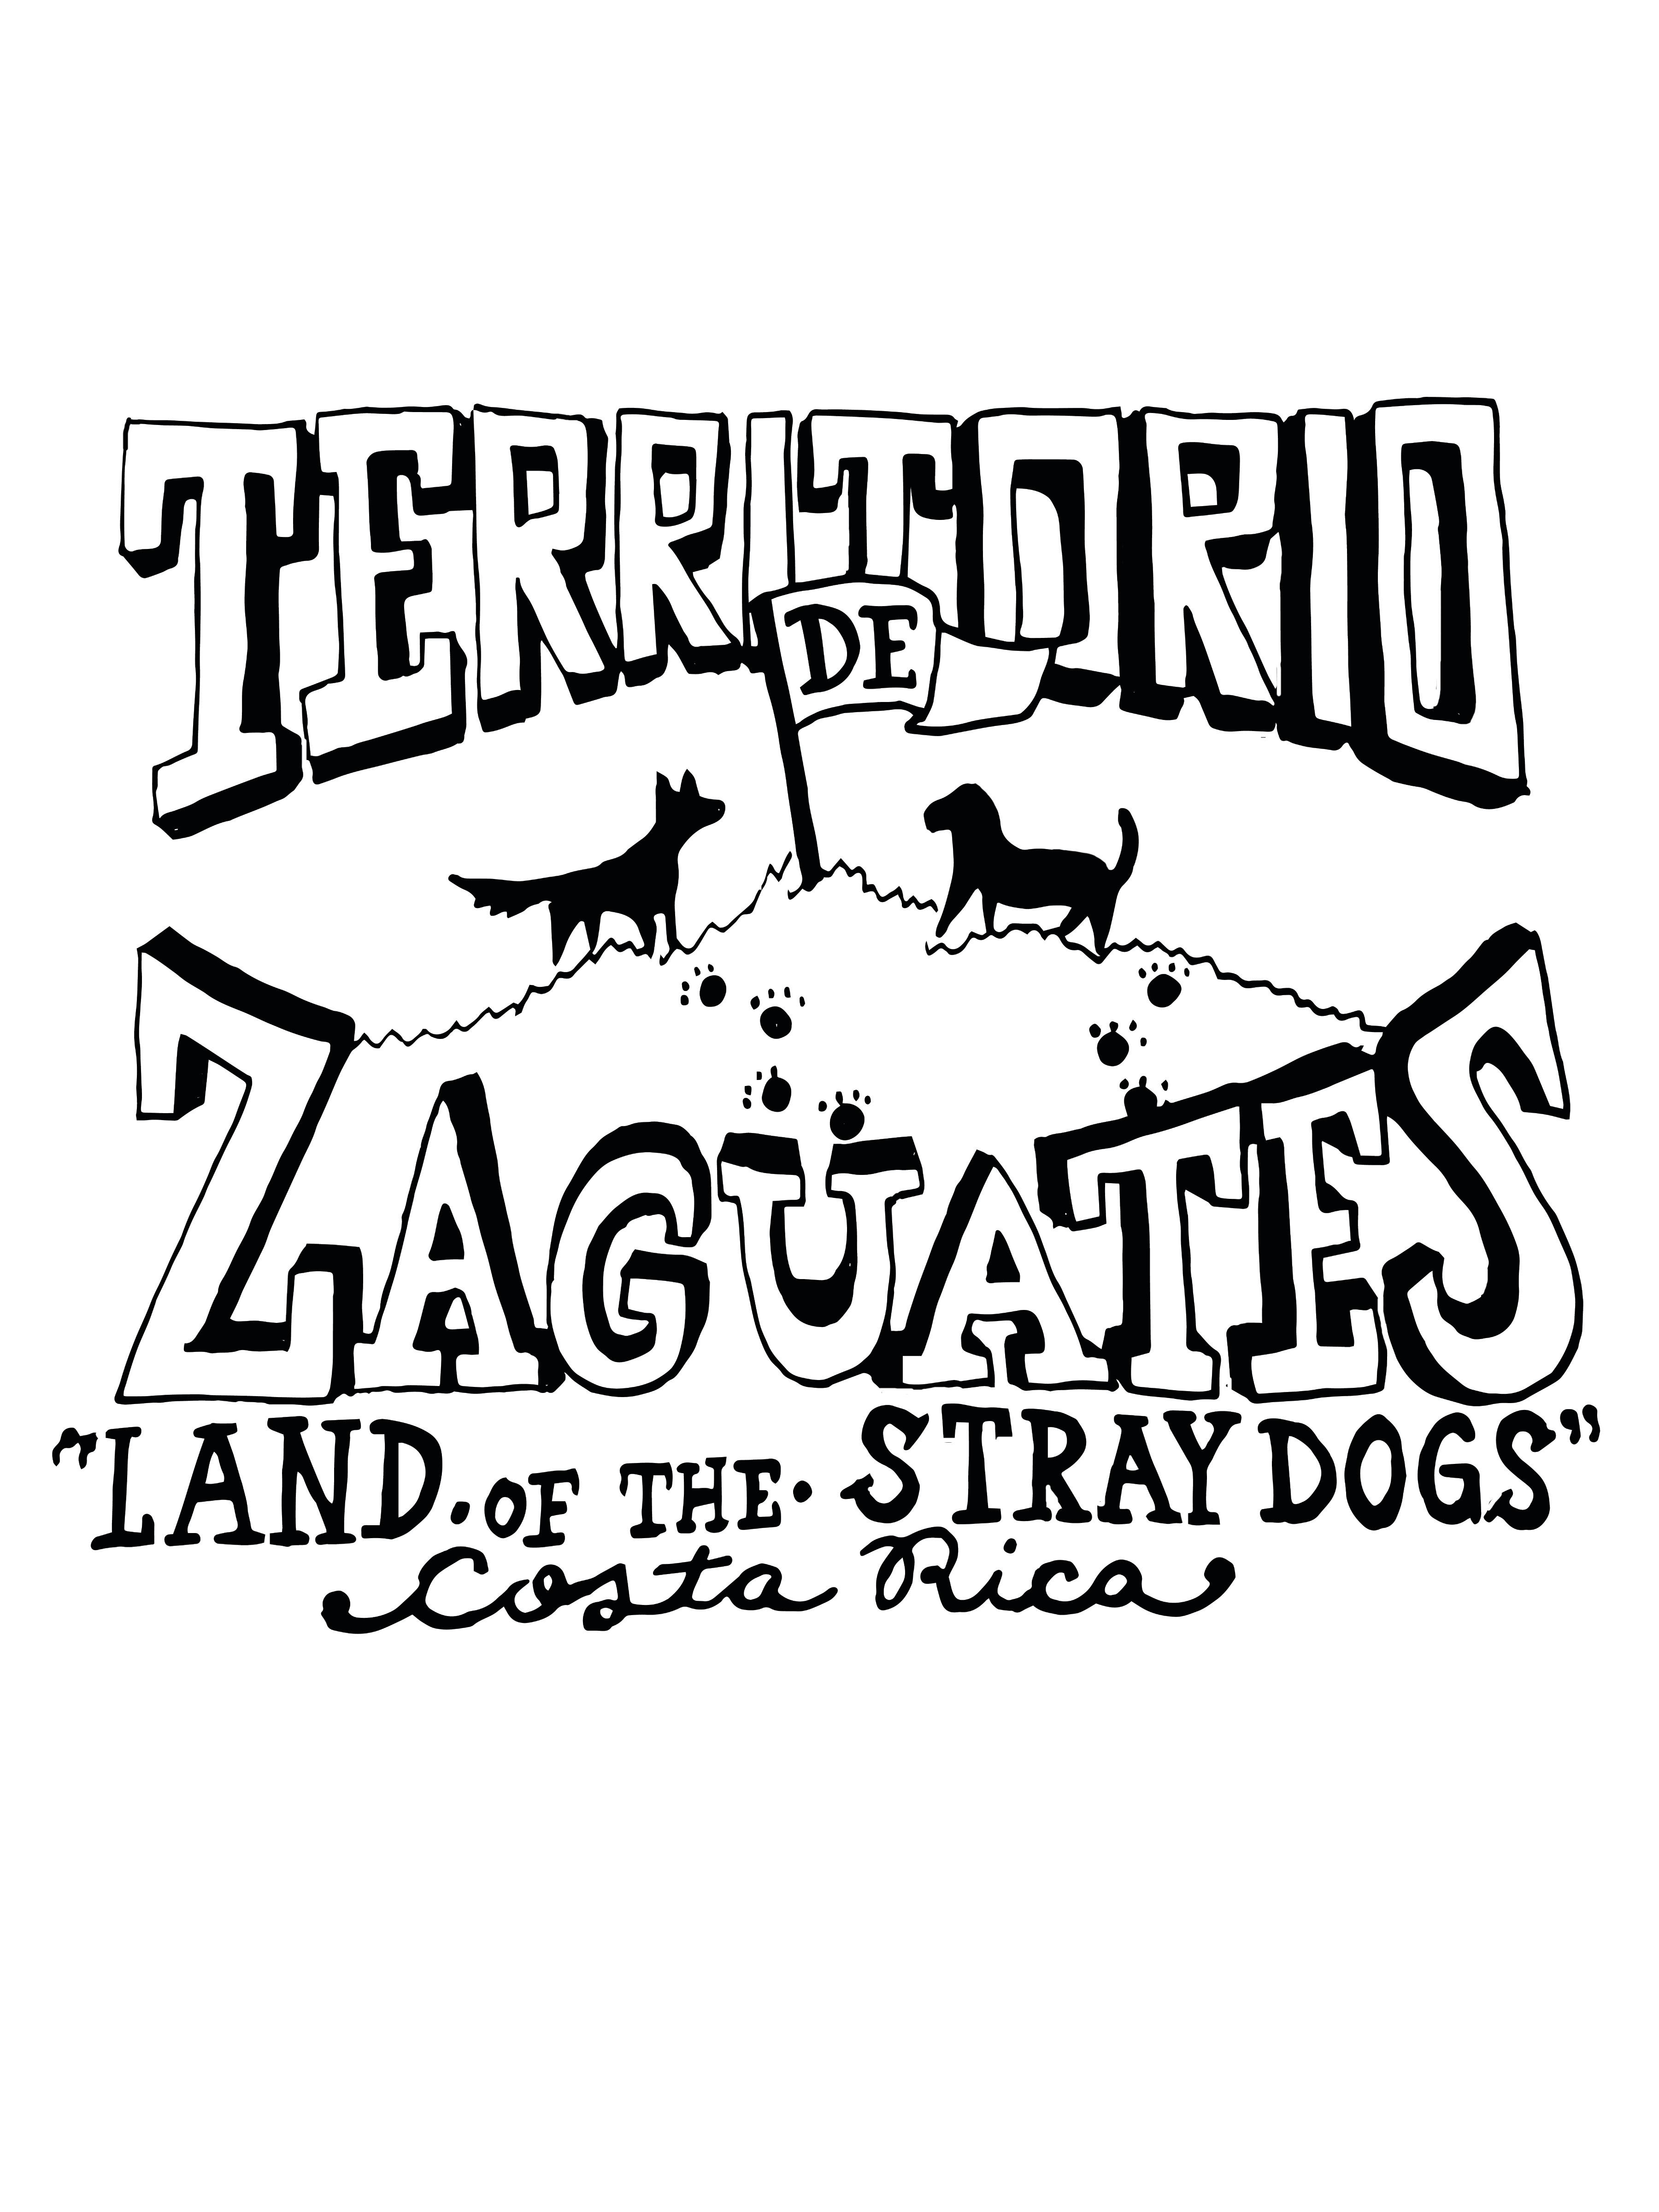 Territorio De Zaguates